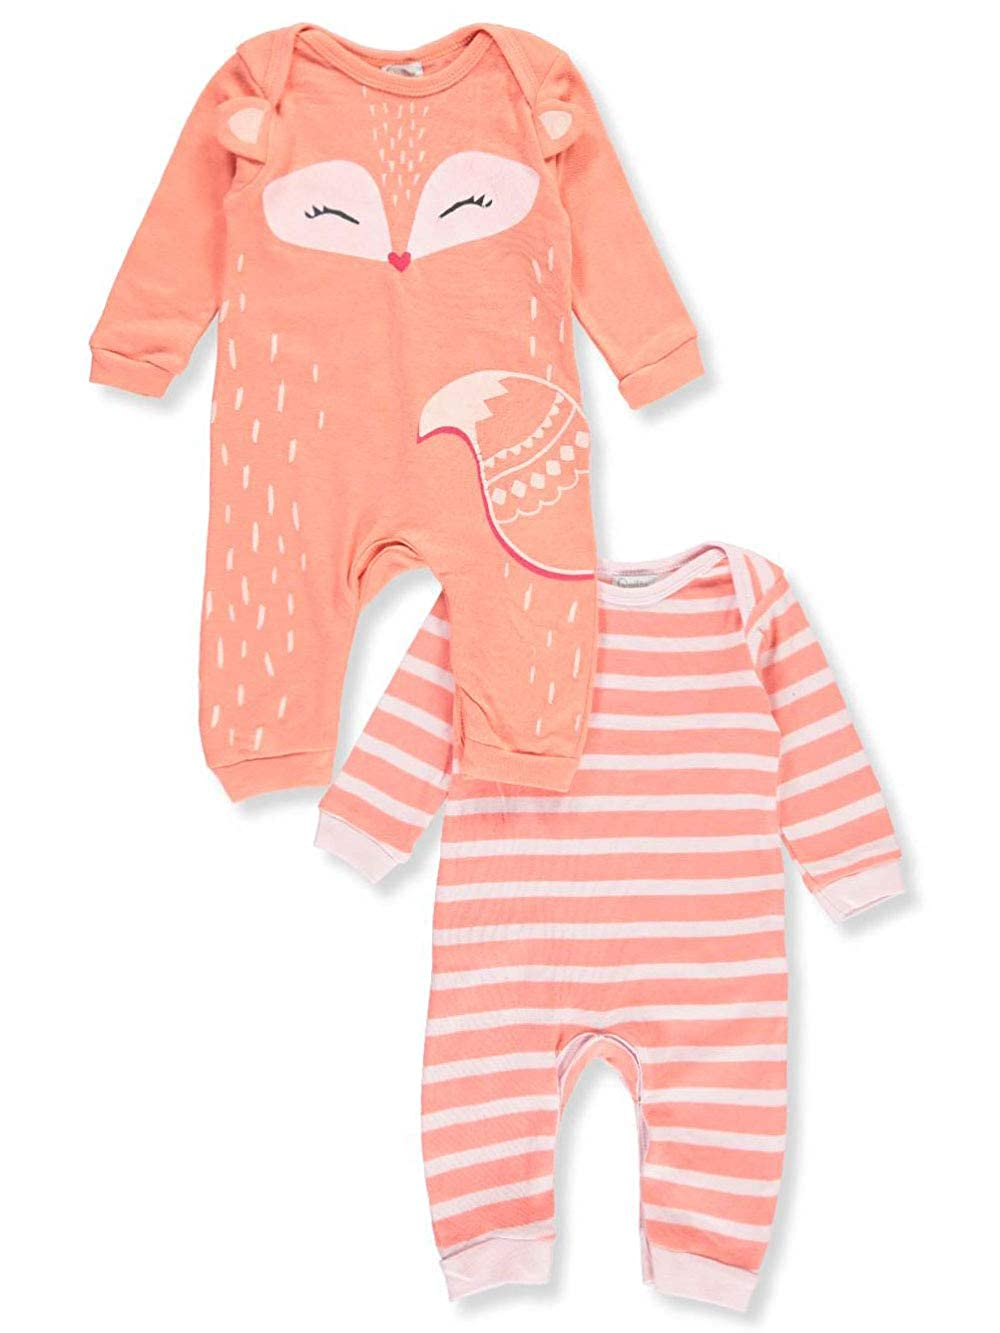 Quiltex Girls Toddler Little Fox Racoon Print Cute Novelty Coverall 2 Pack Set